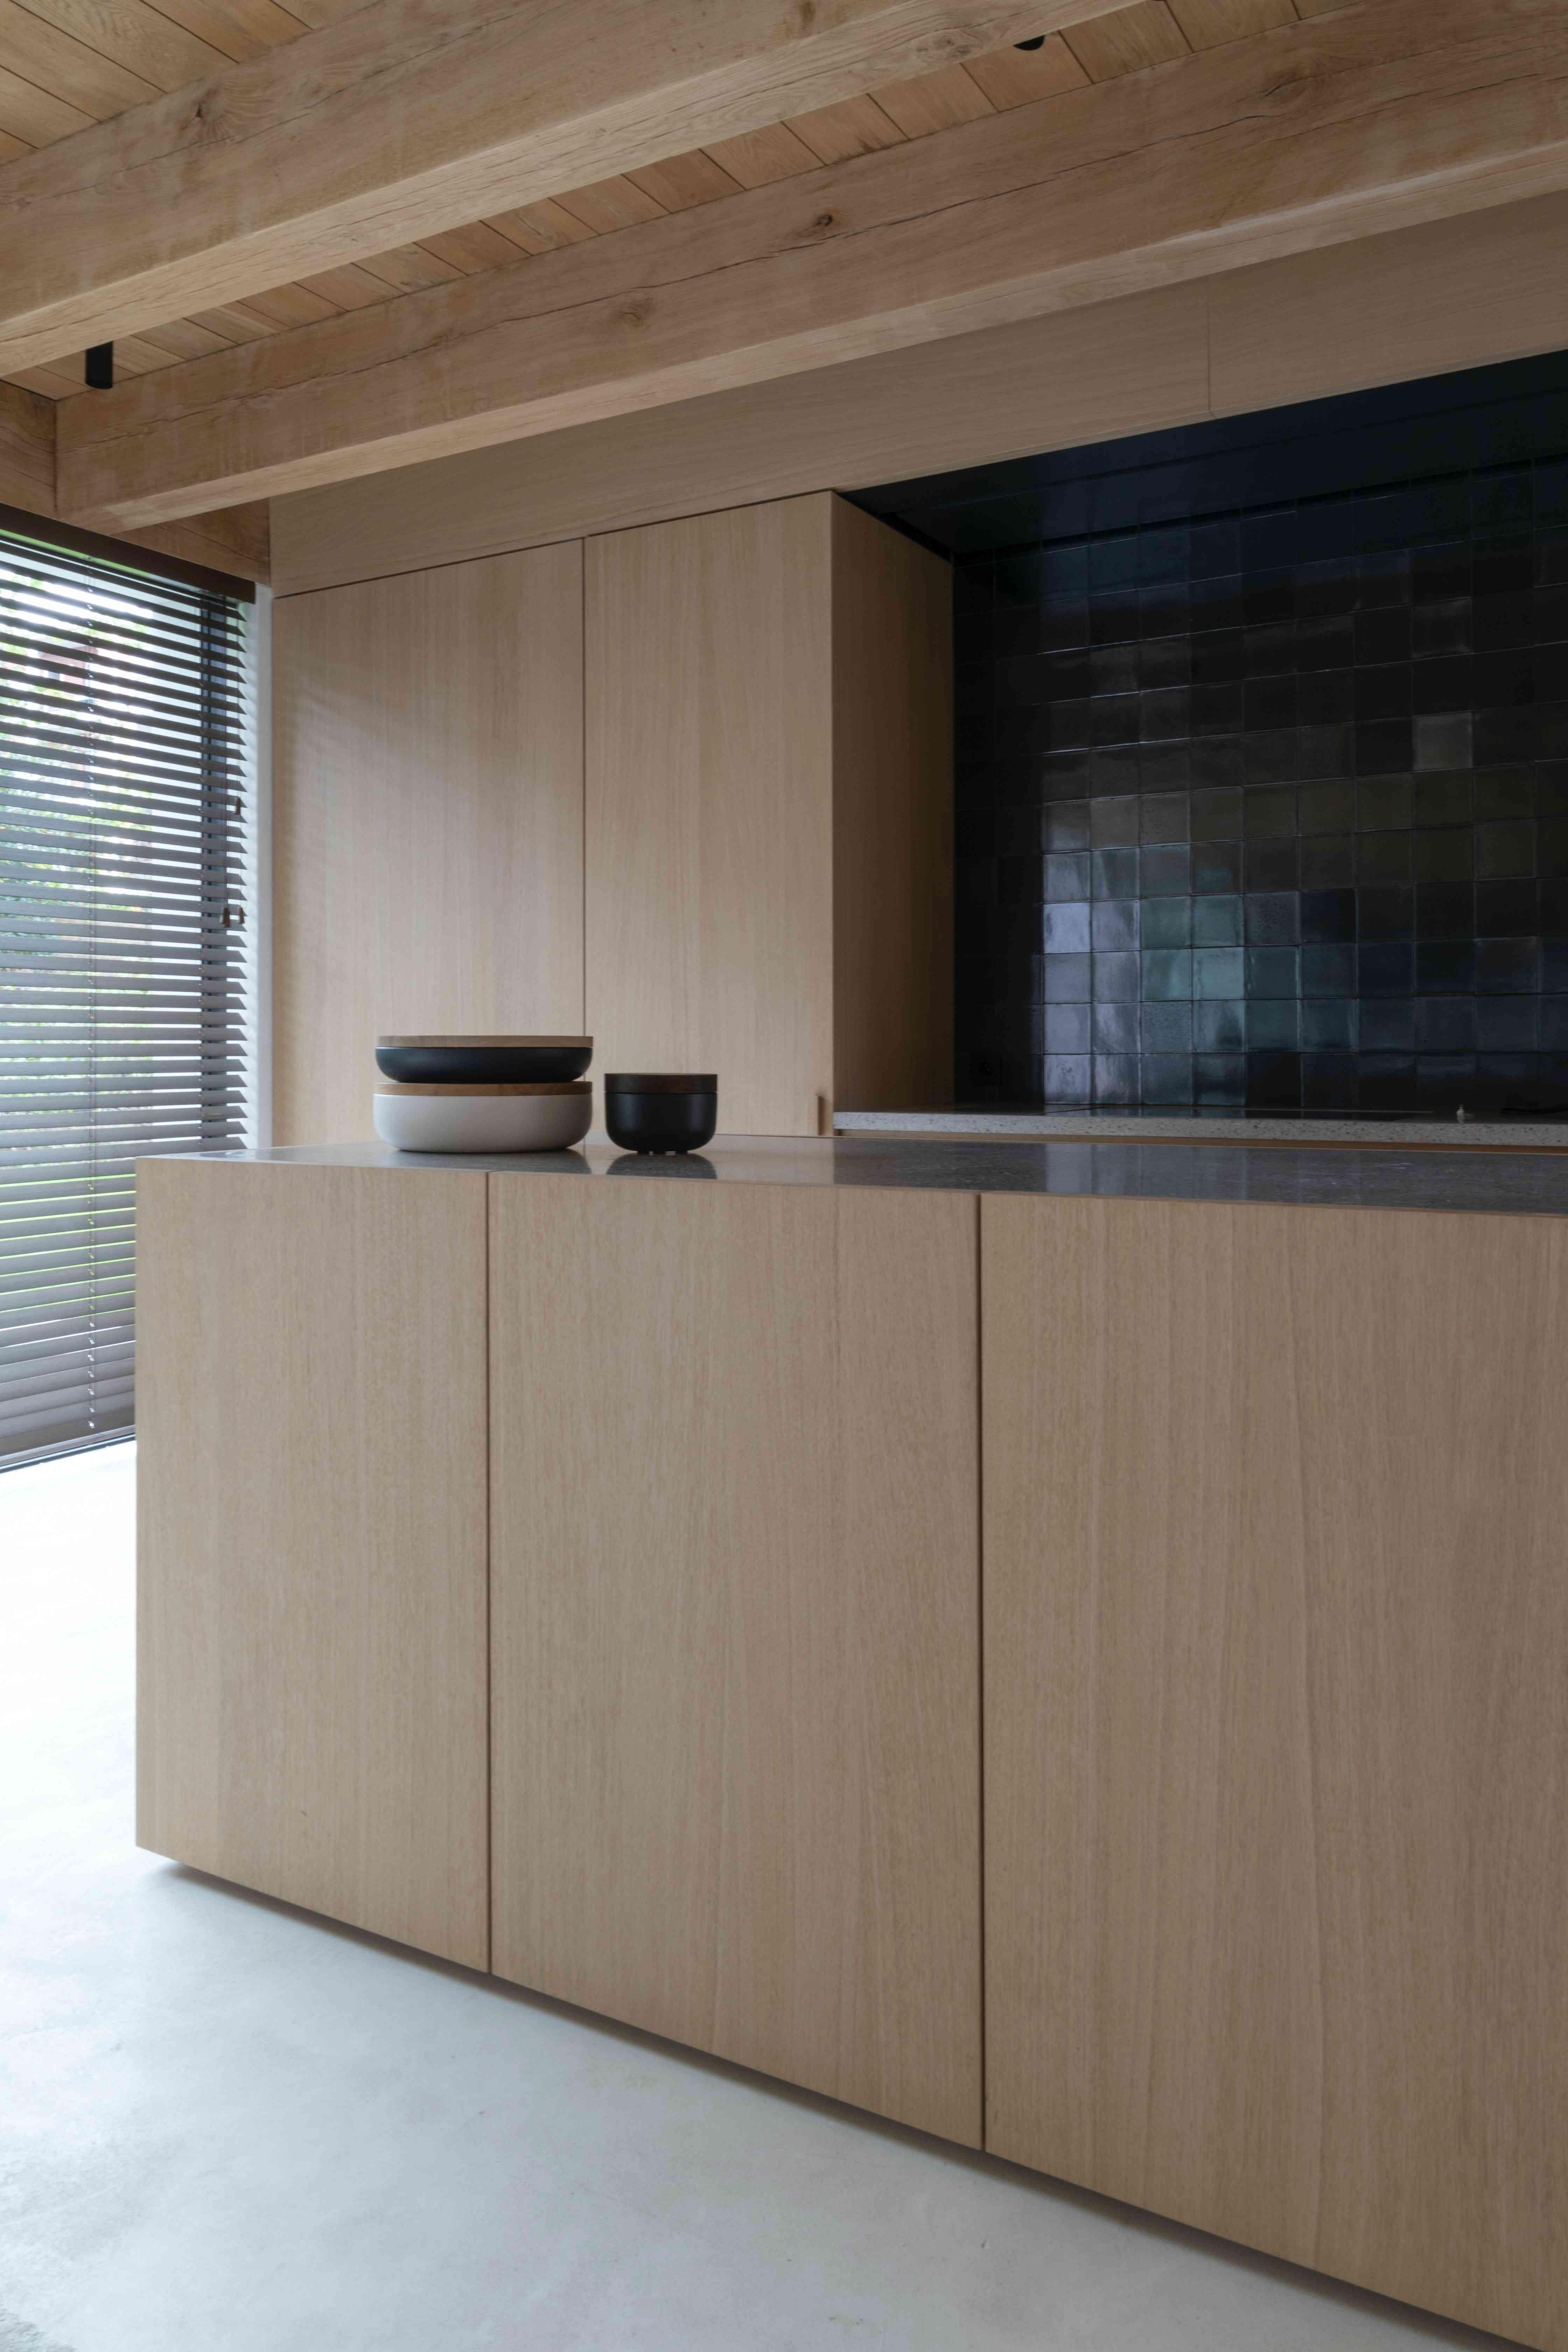 wood kitchen with black backsplash